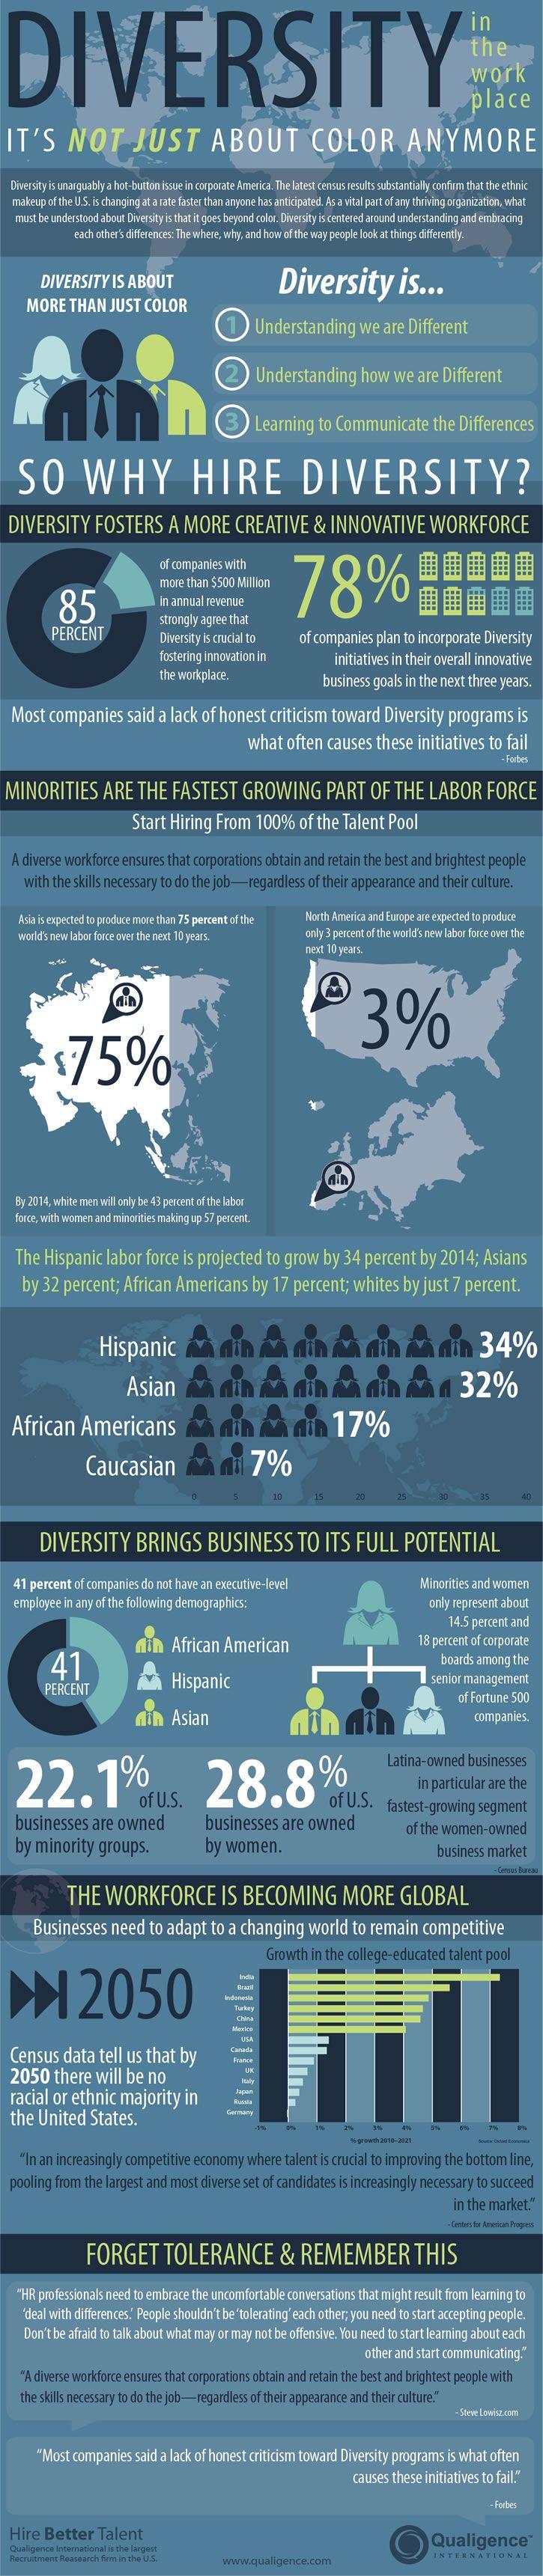 diversity infographic teampegine com infographs diversity infographic teampegine com